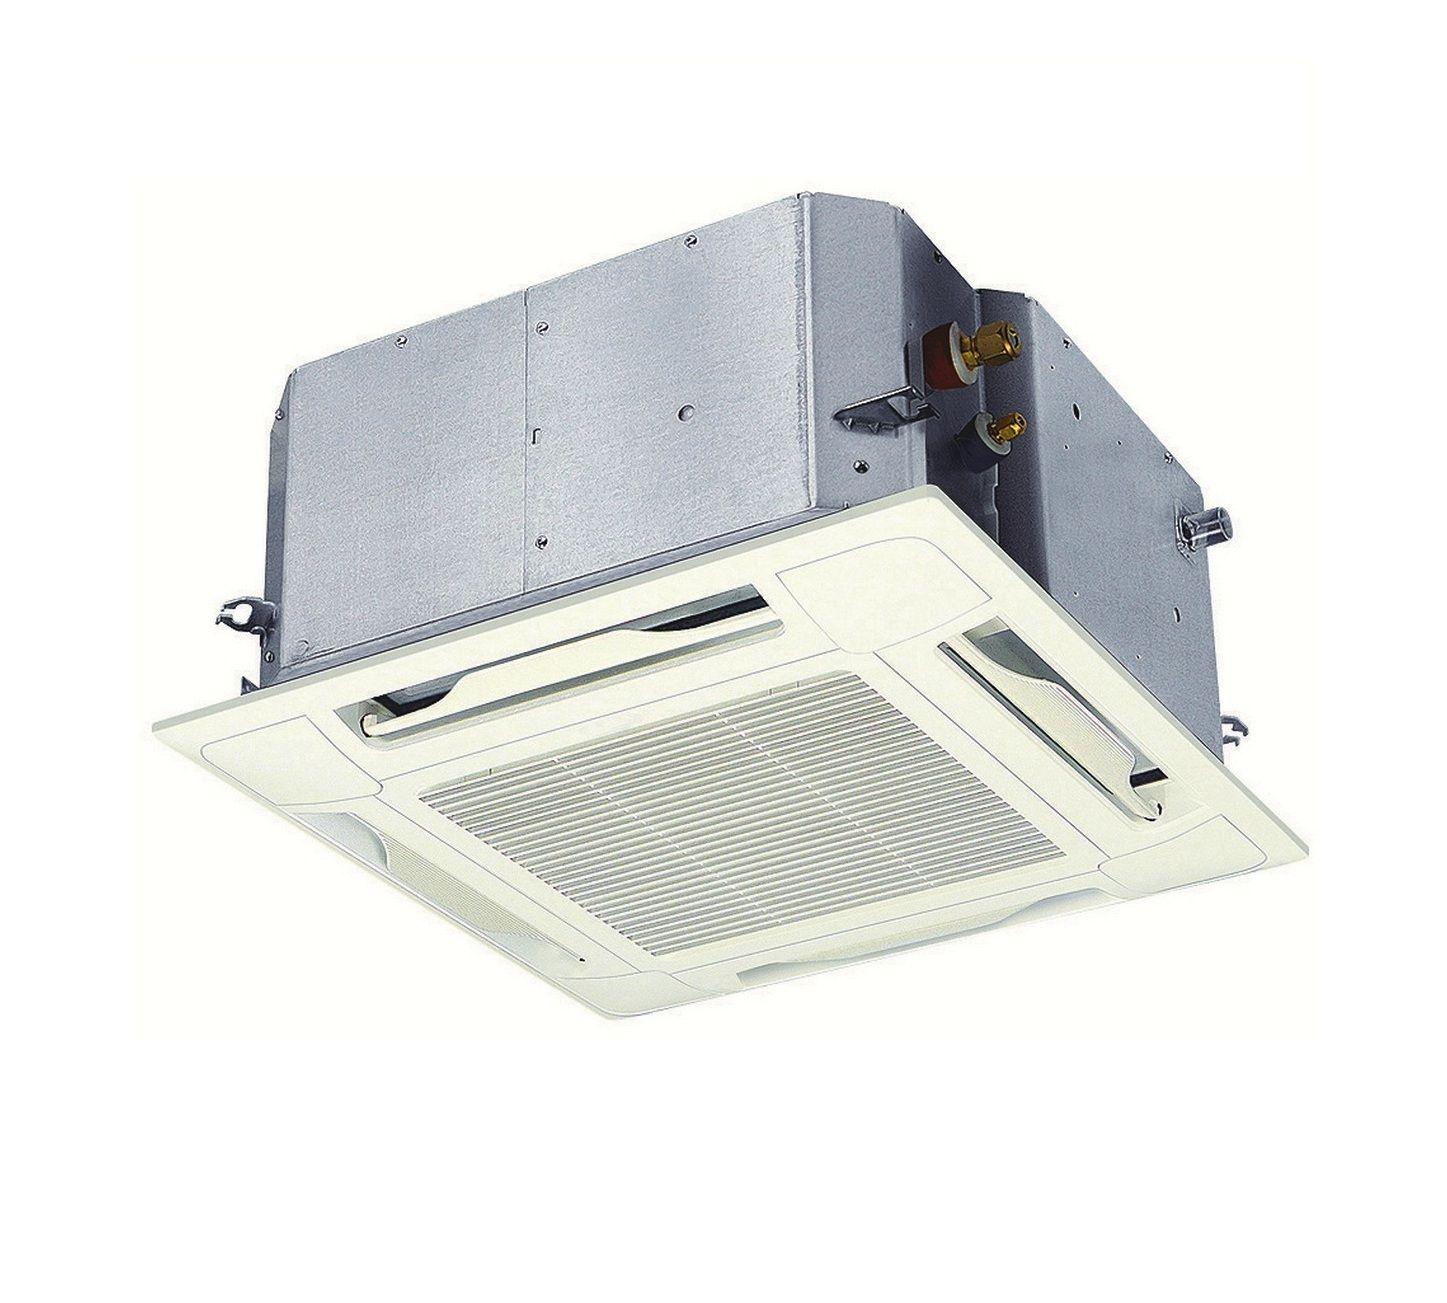 The Strong Panasonic Air Purifier Cooling Unit Heat Pump Air Conditioner Heat Pump